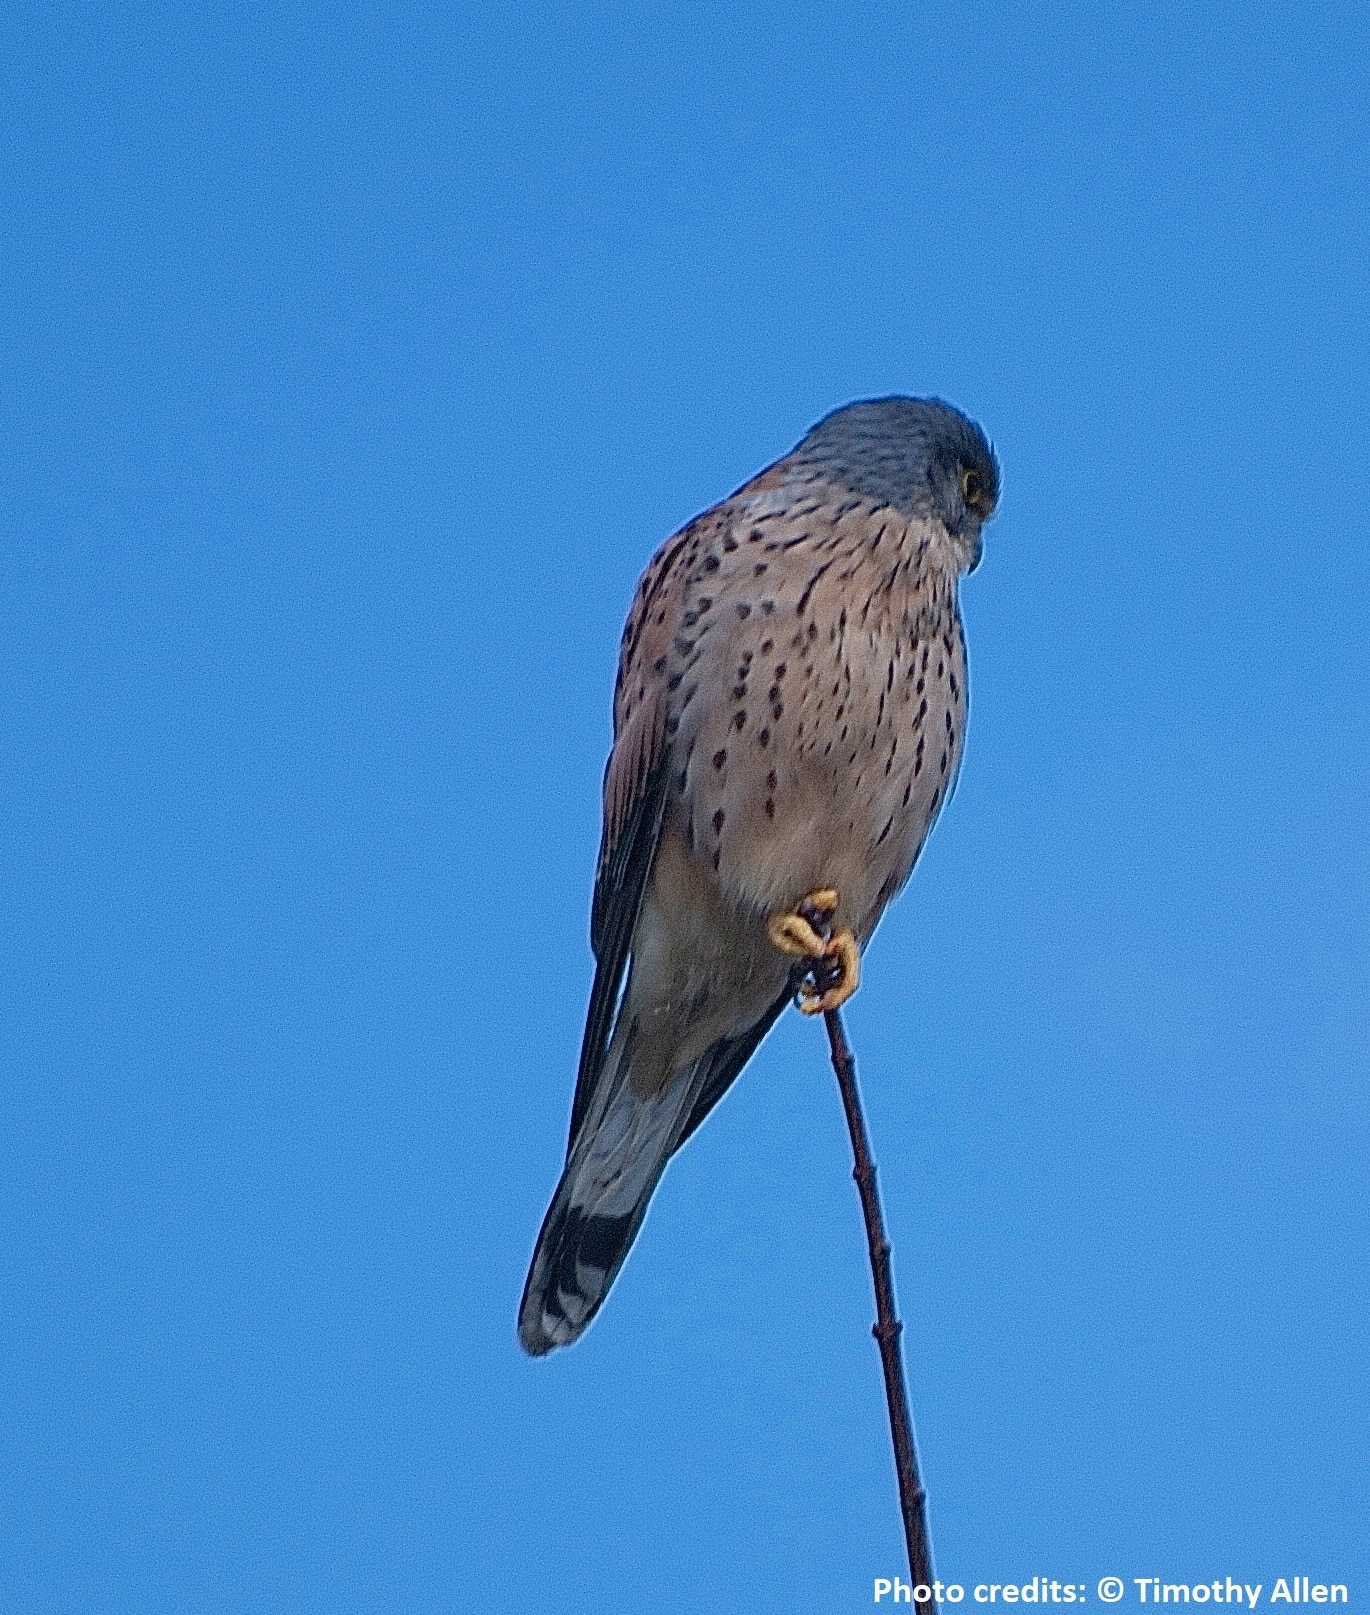 Farmland bird: Kestrel, Falco tinnunculus